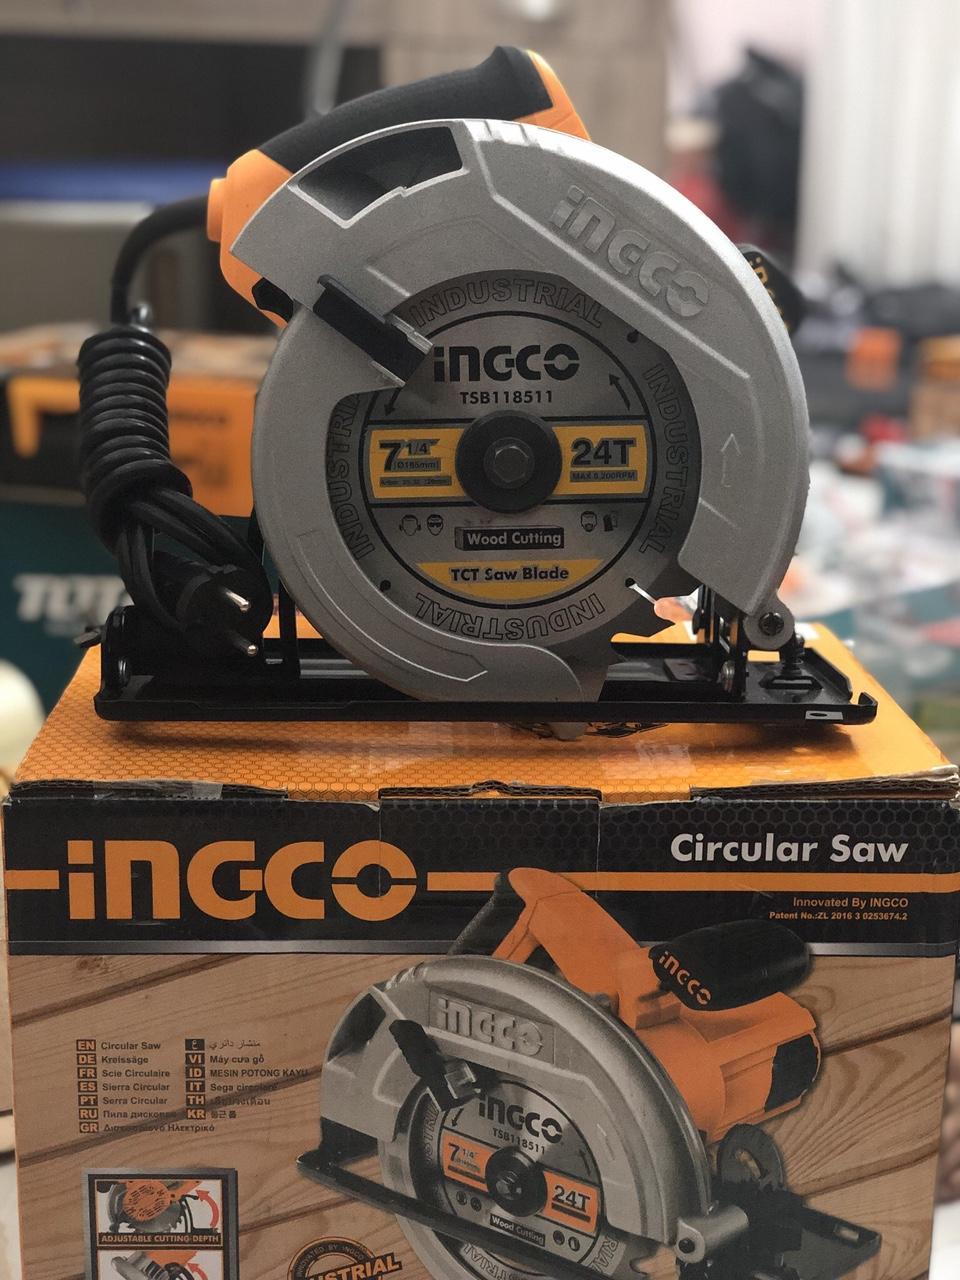 1600W/185mm Máy cưa đĩa tròn Ingco CS18568